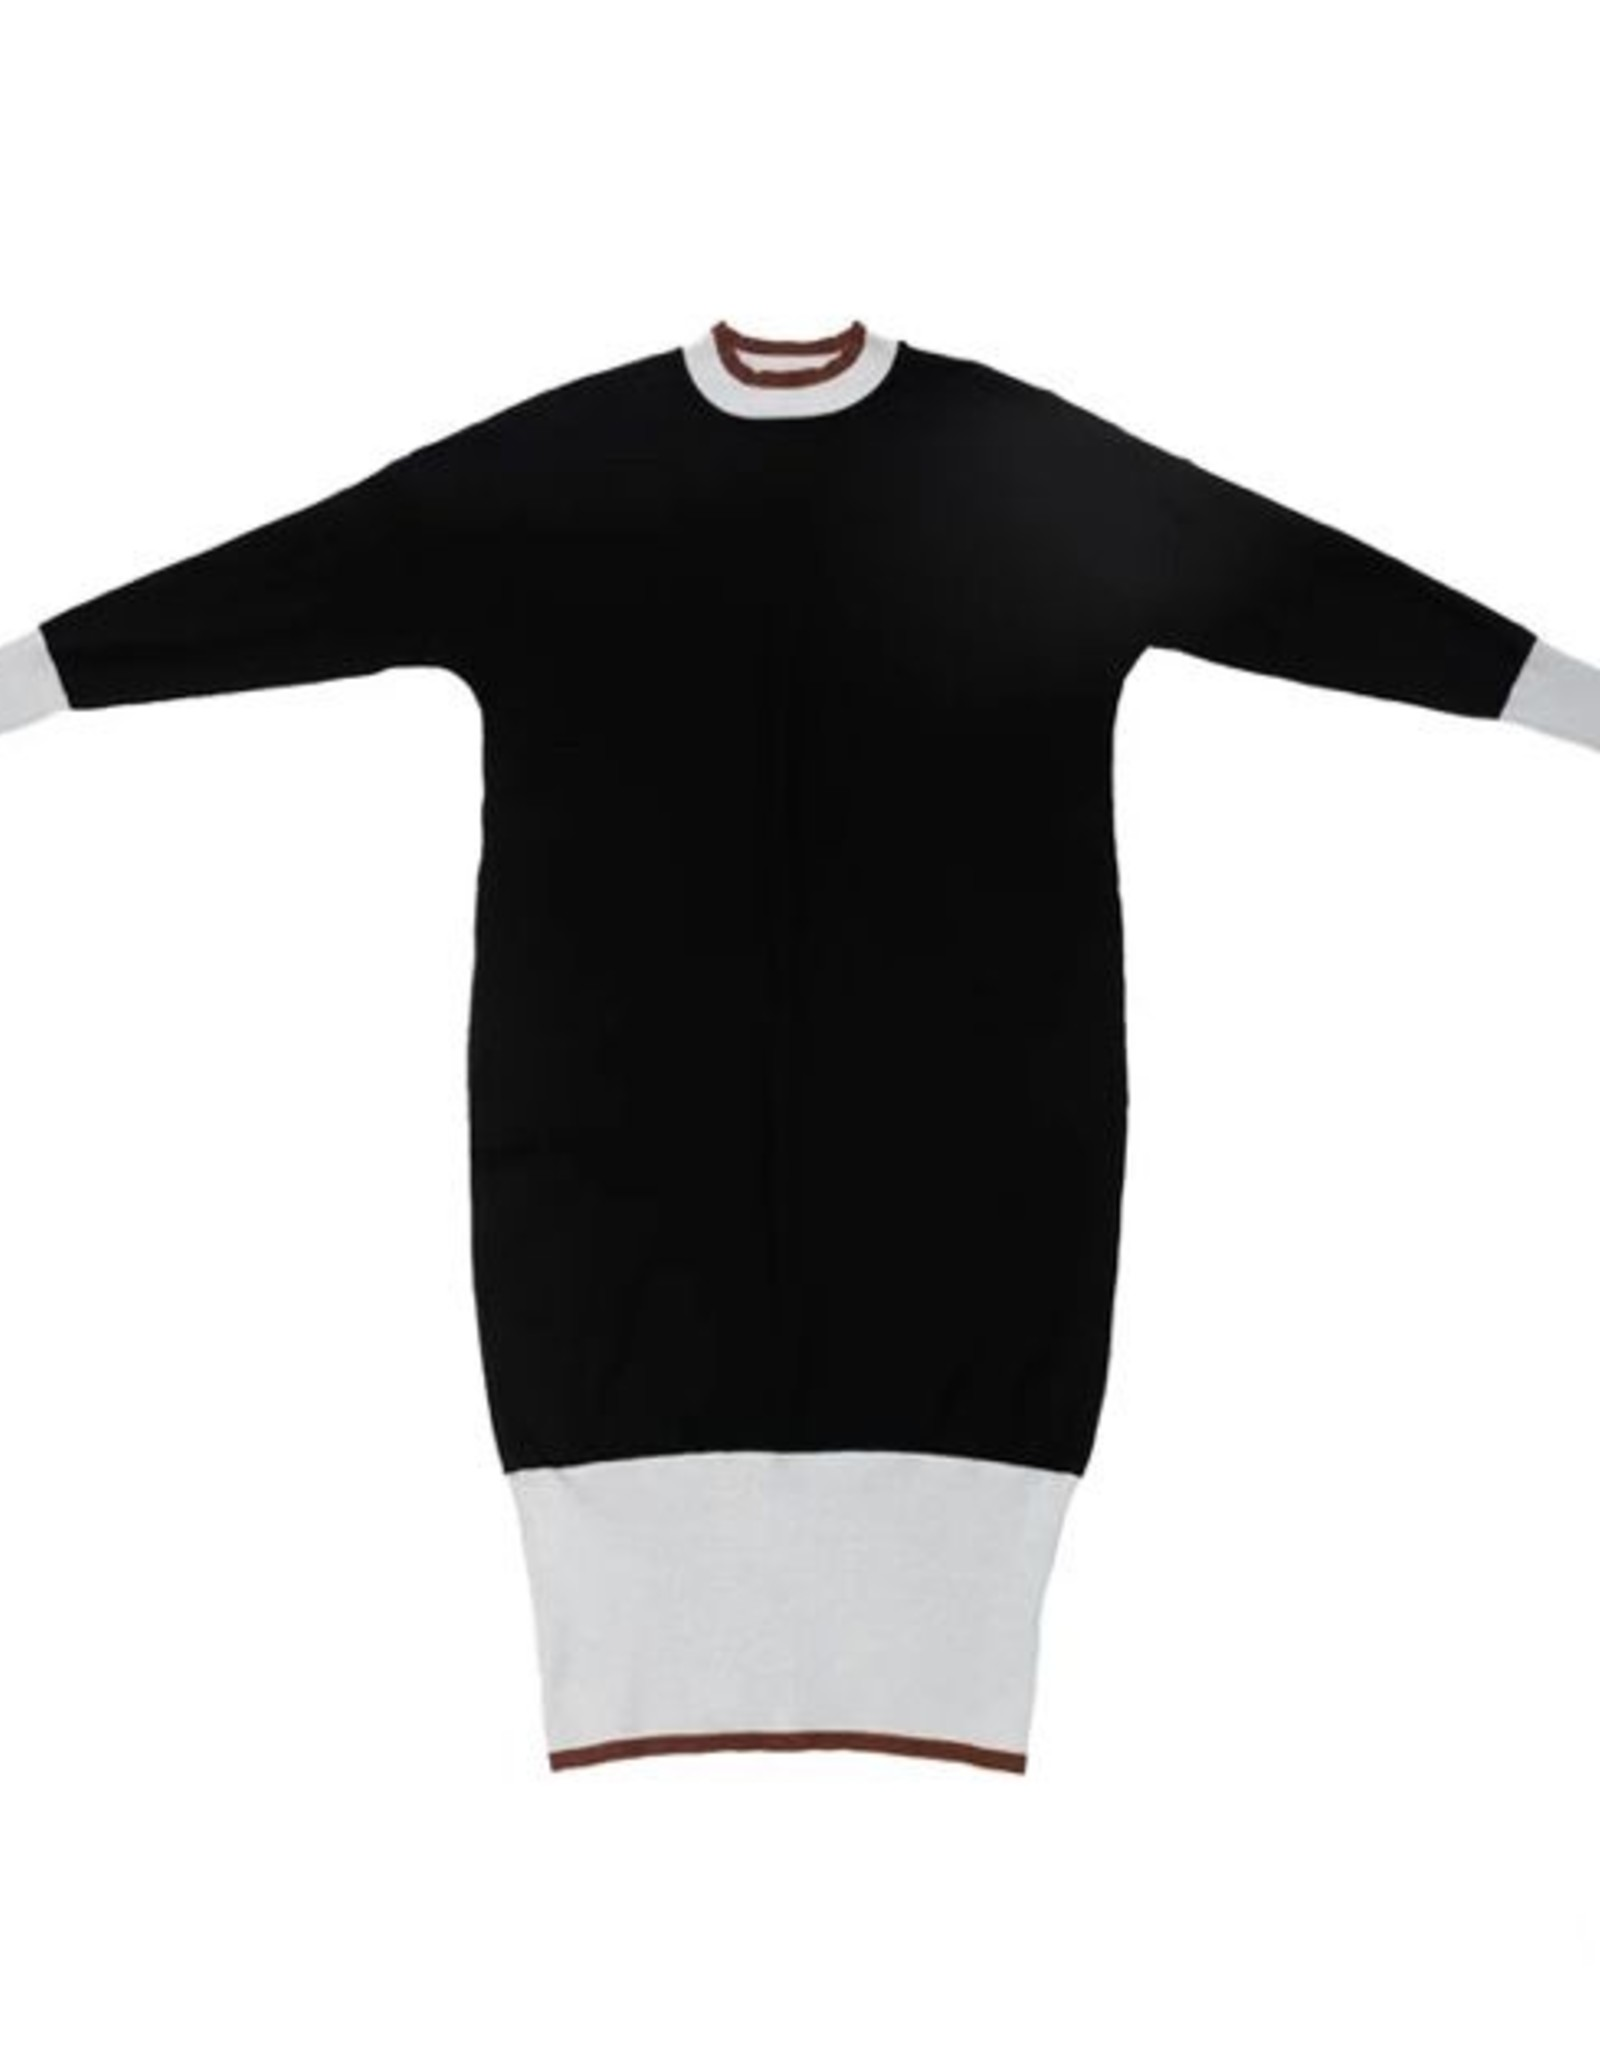 UNCLEAR Unclear Colorblock Knit Dress